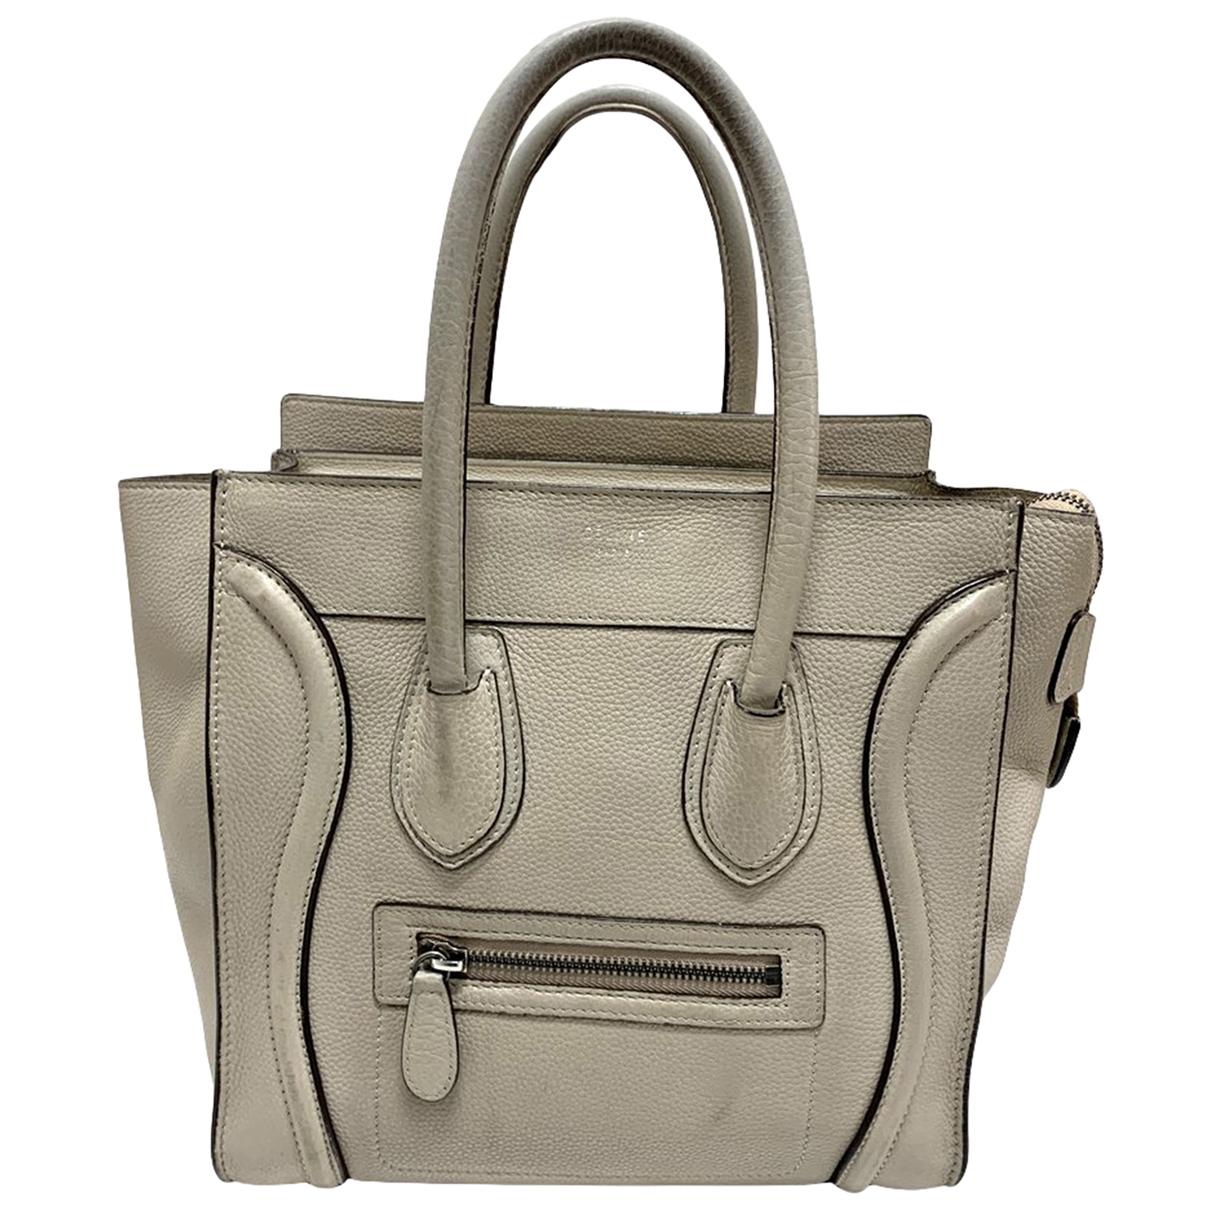 Celine Luggage Beige Leather handbag for Women \N